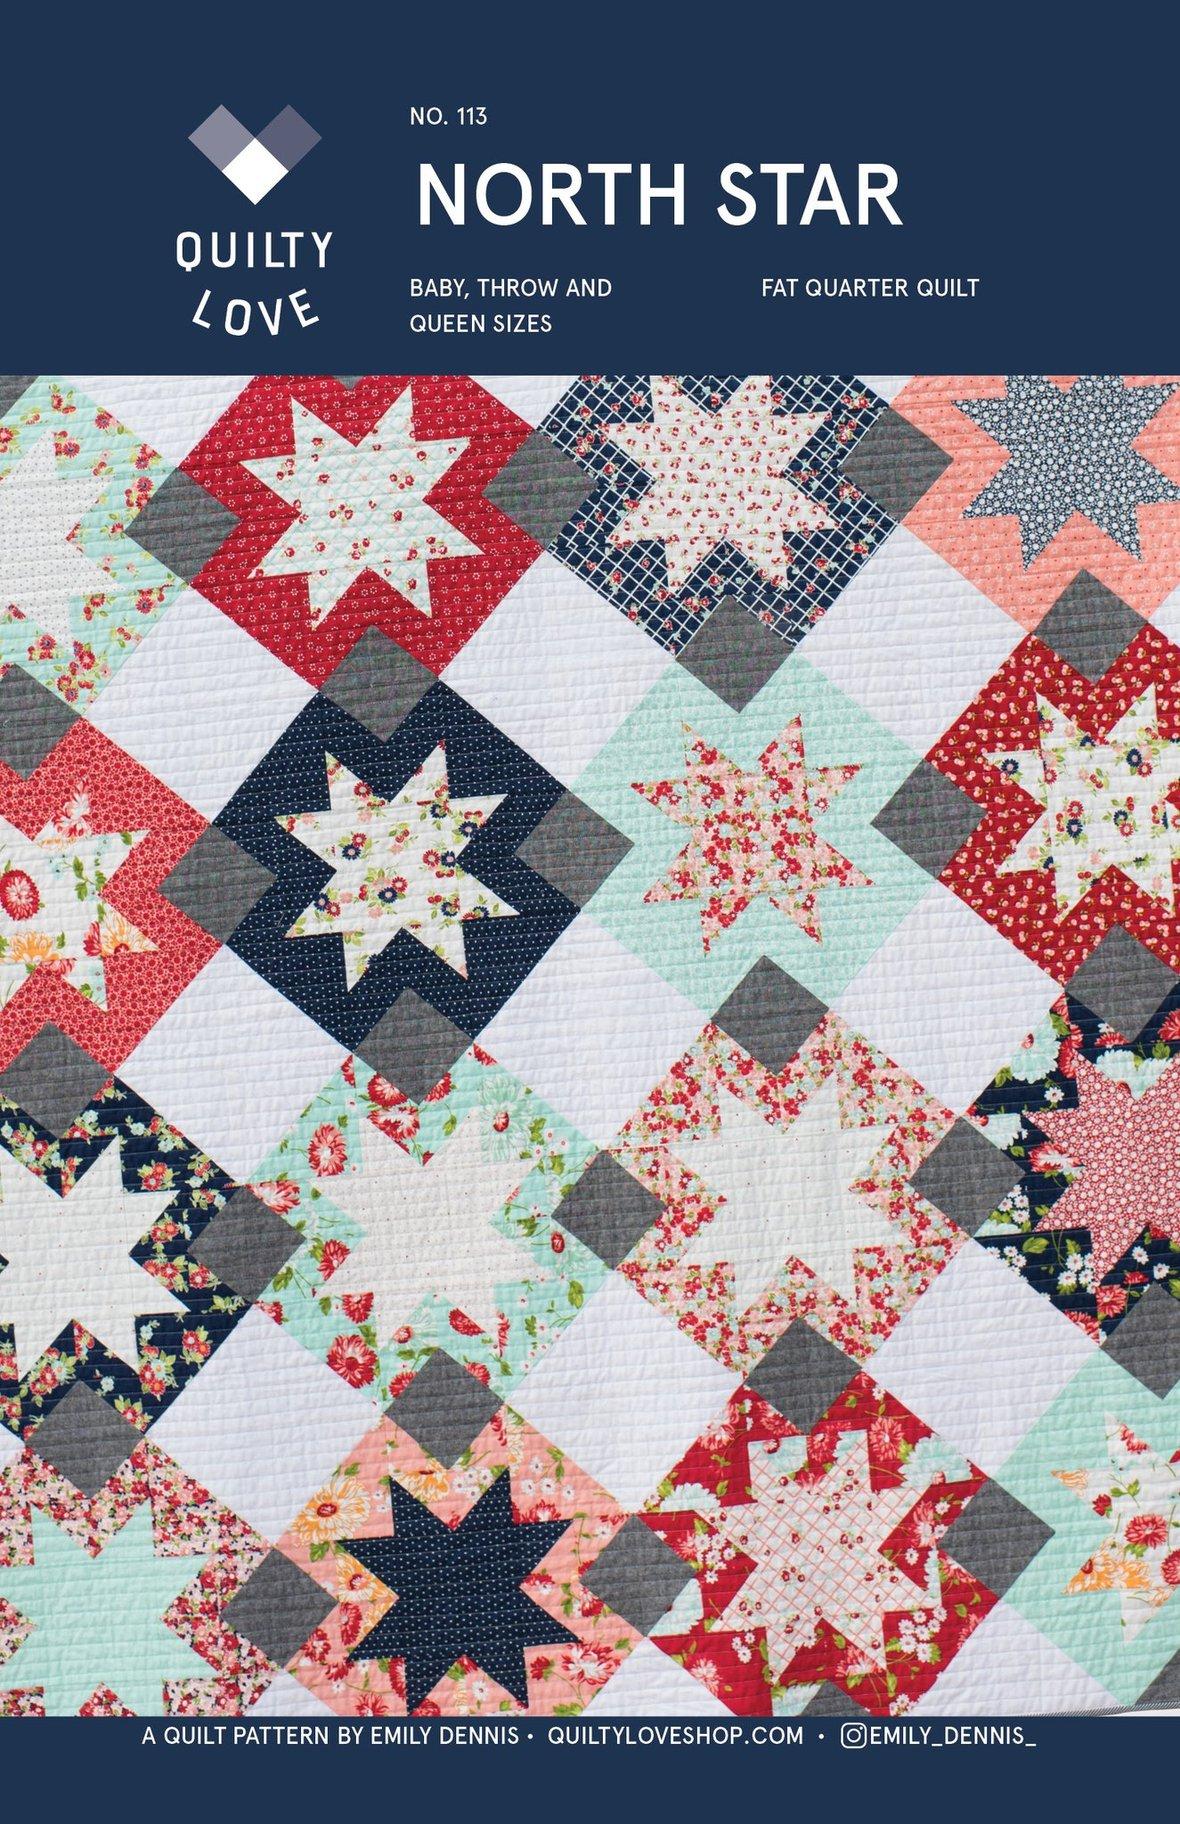 PAPER North Star Quilt Pattern REBRAND 1024x1024 2x